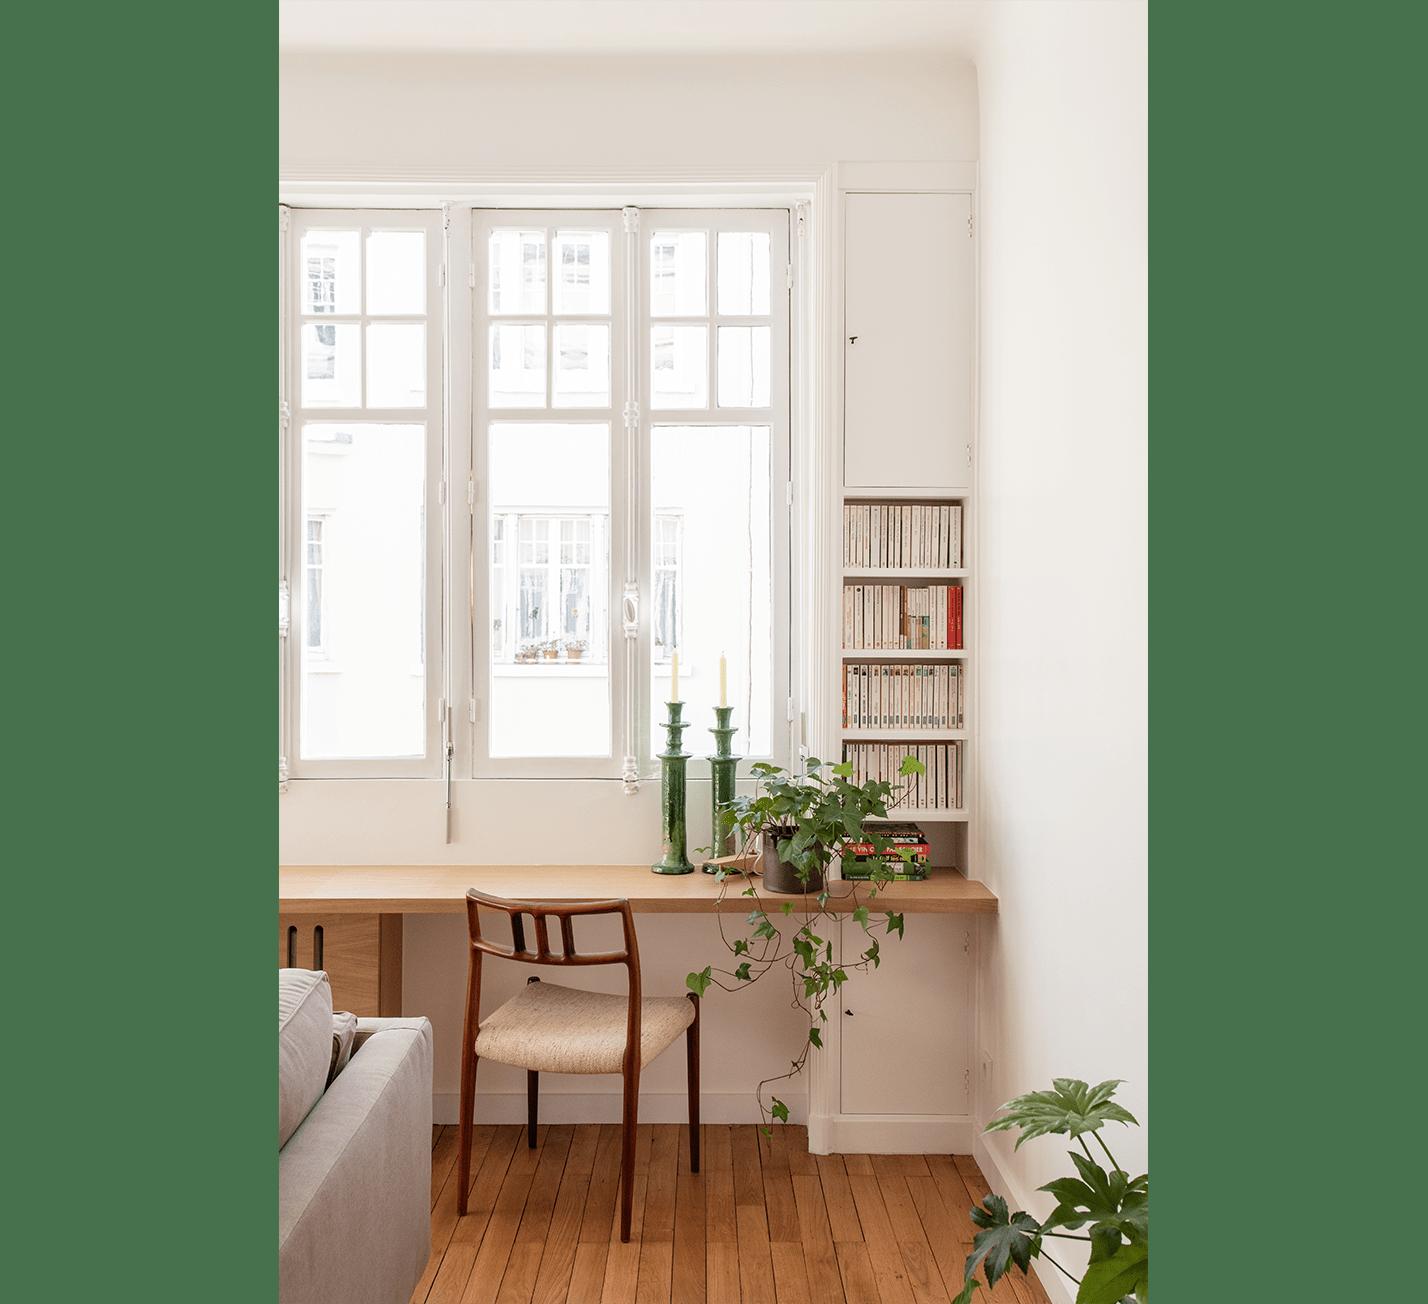 Projet-Emile-Atelier-Steve-Pauline-Borgia-Architecte-interieur-18-min